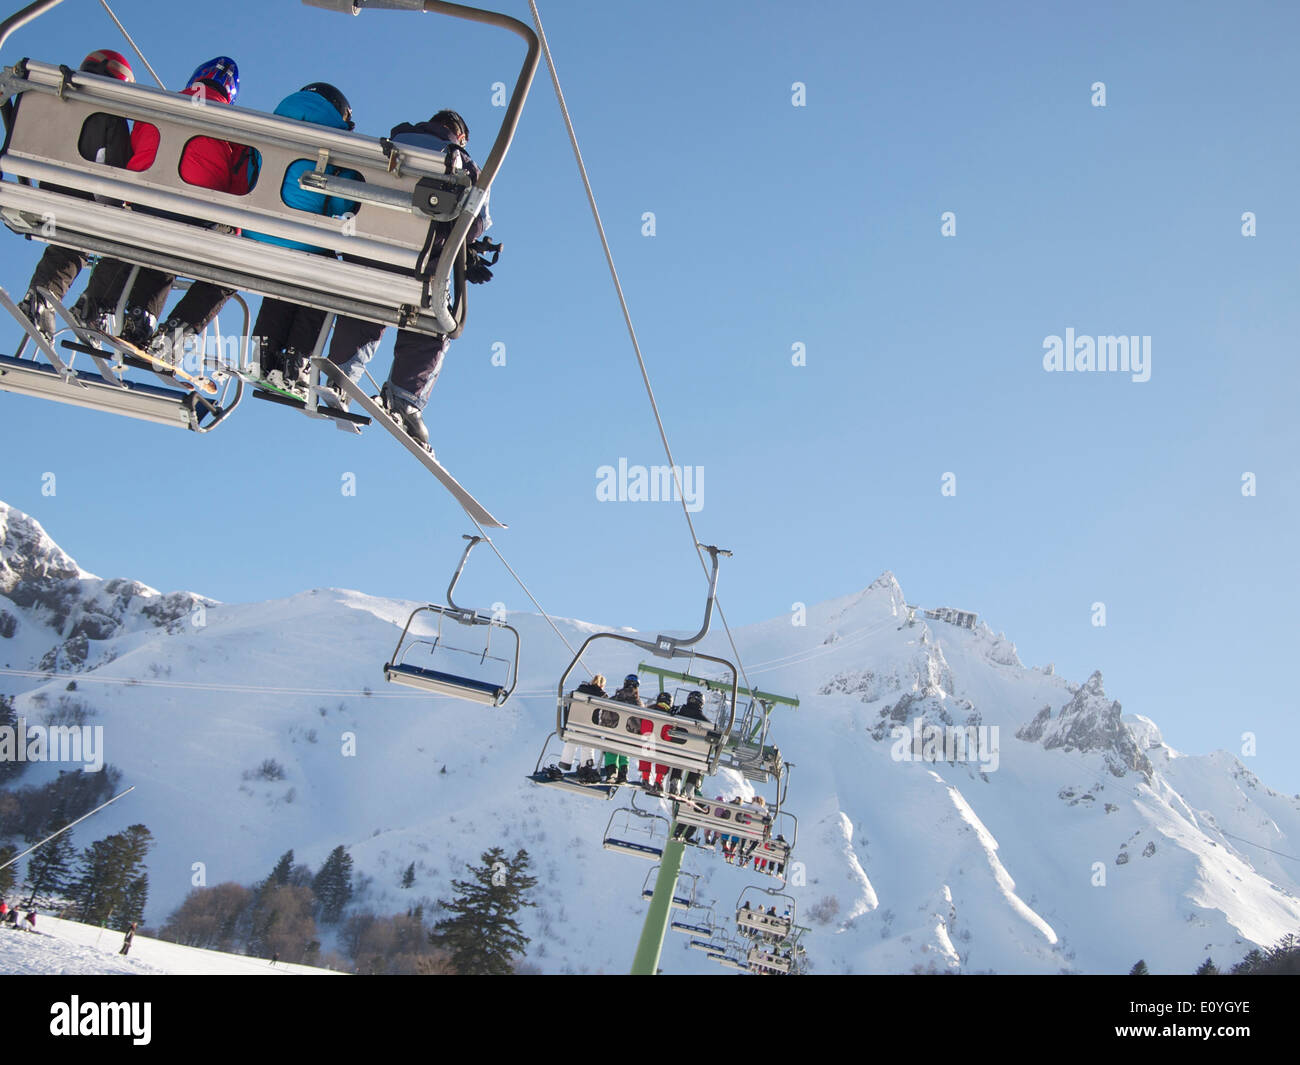 Skiers on a ski lift at Le Mont-Dore ski resort, Massif of Sancy, Auvergne, France - Stock Image